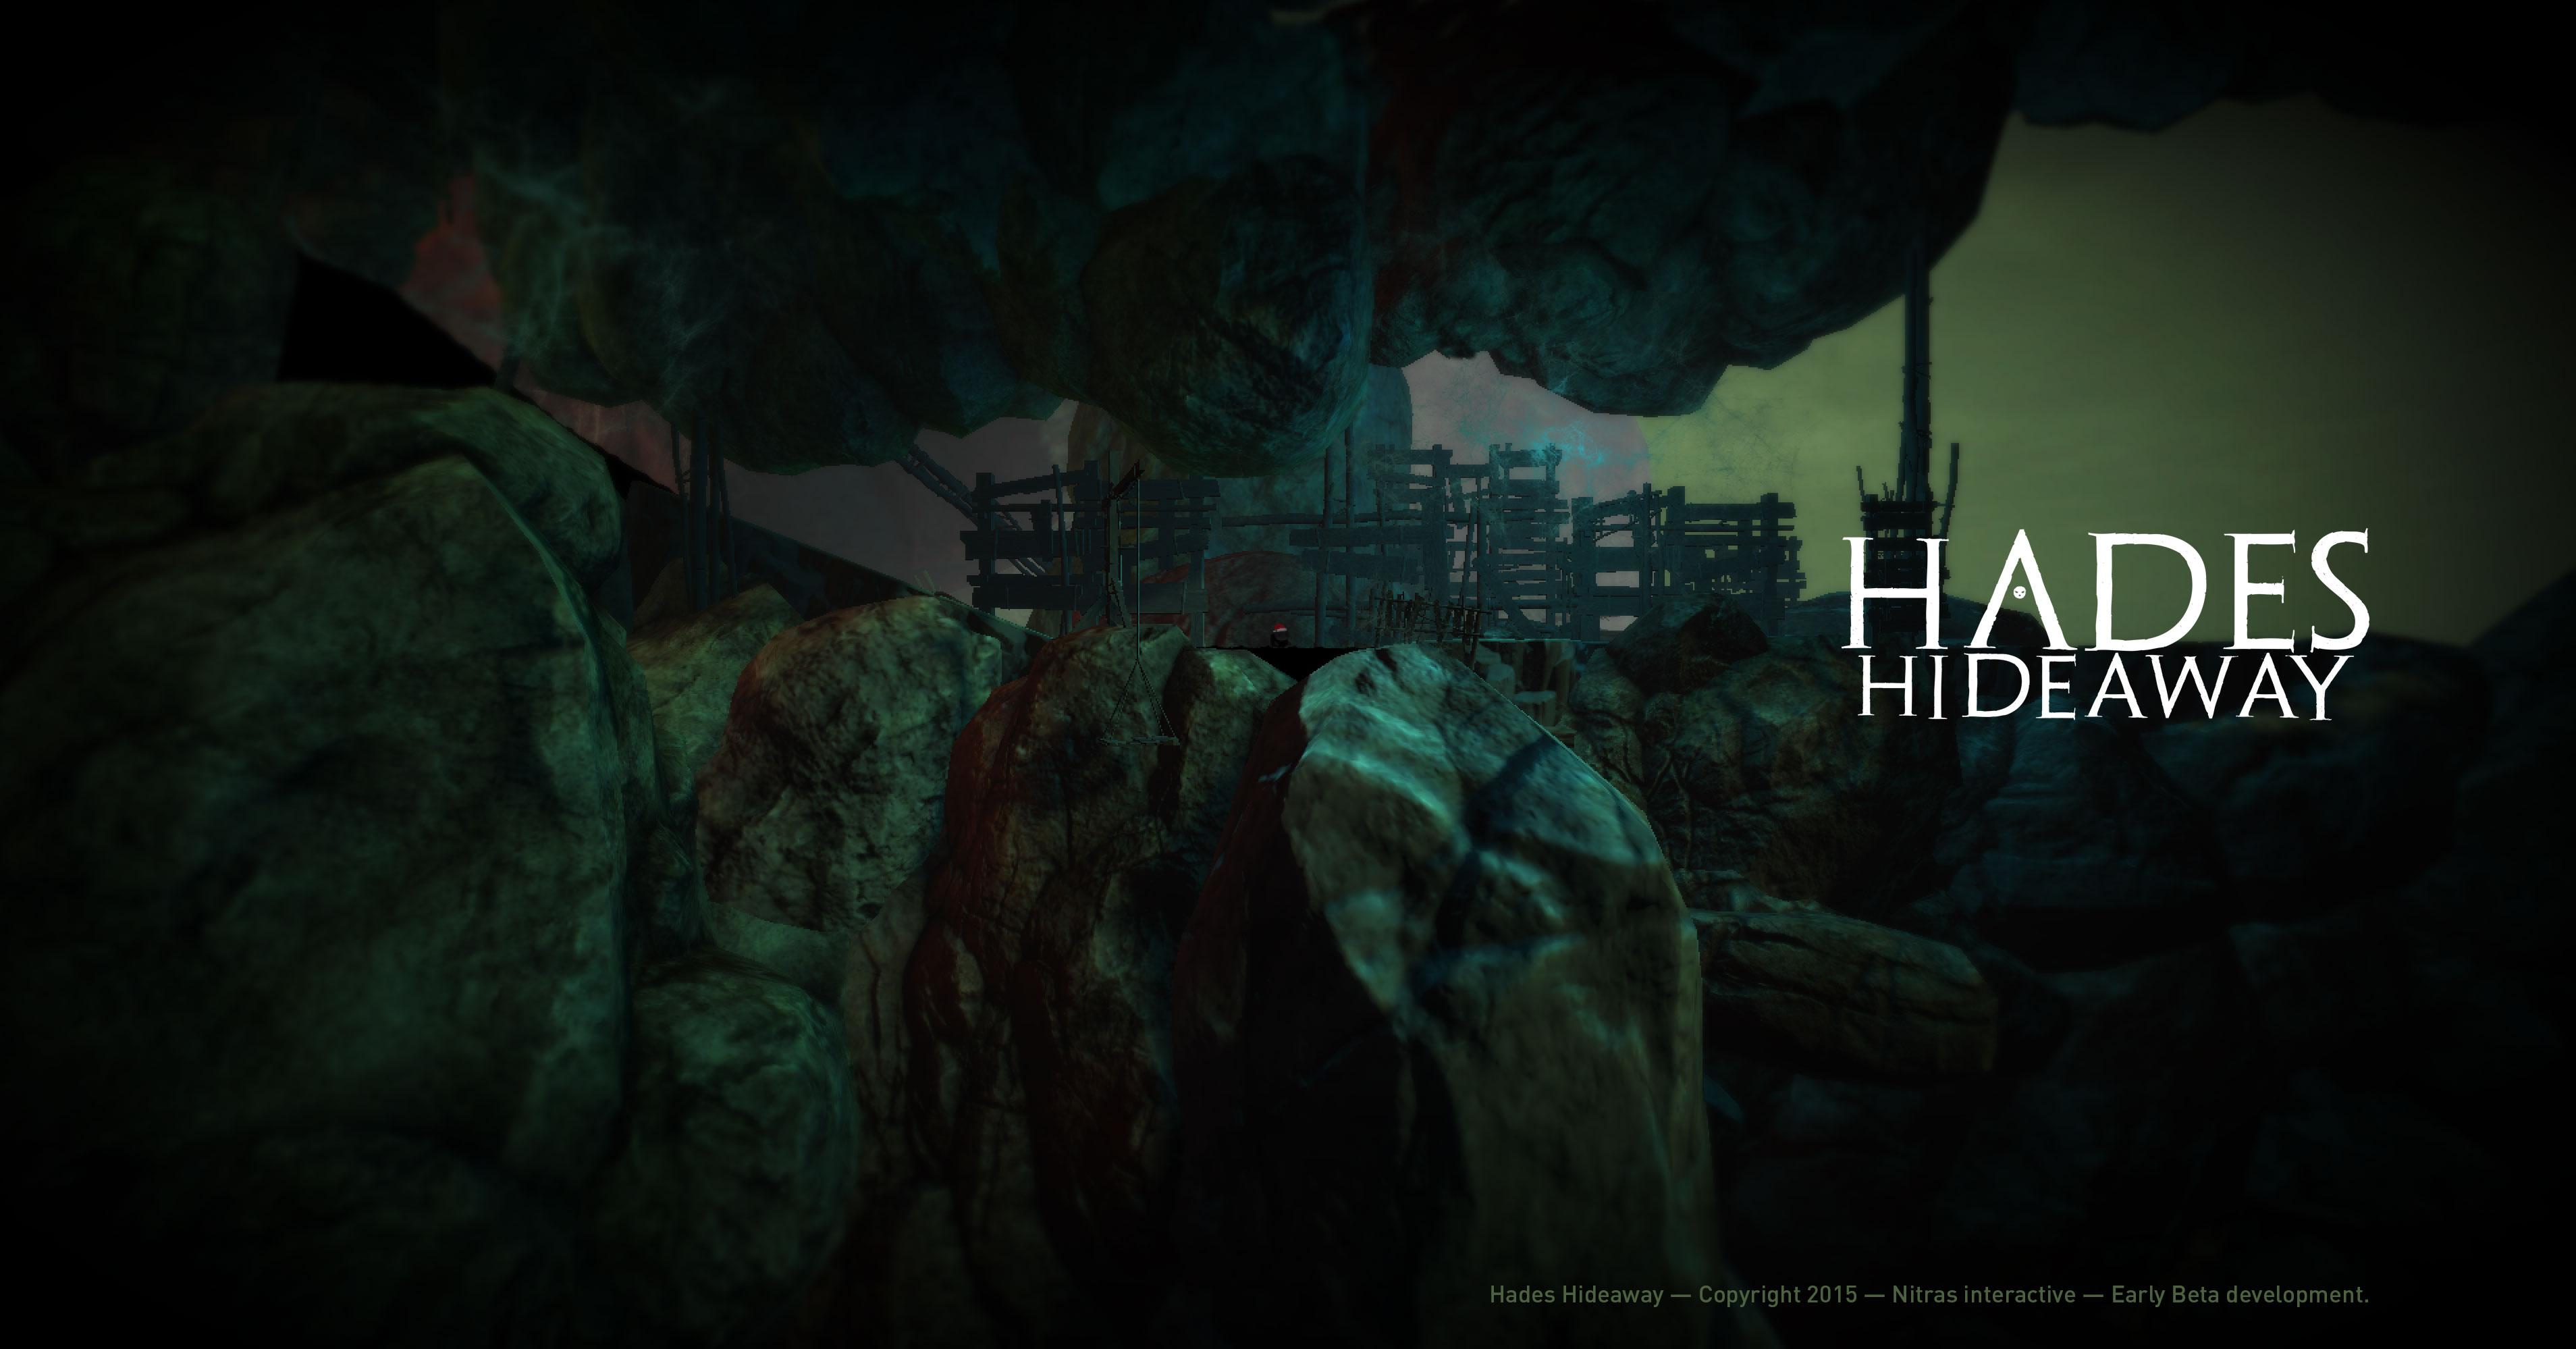 Hades Hideaway